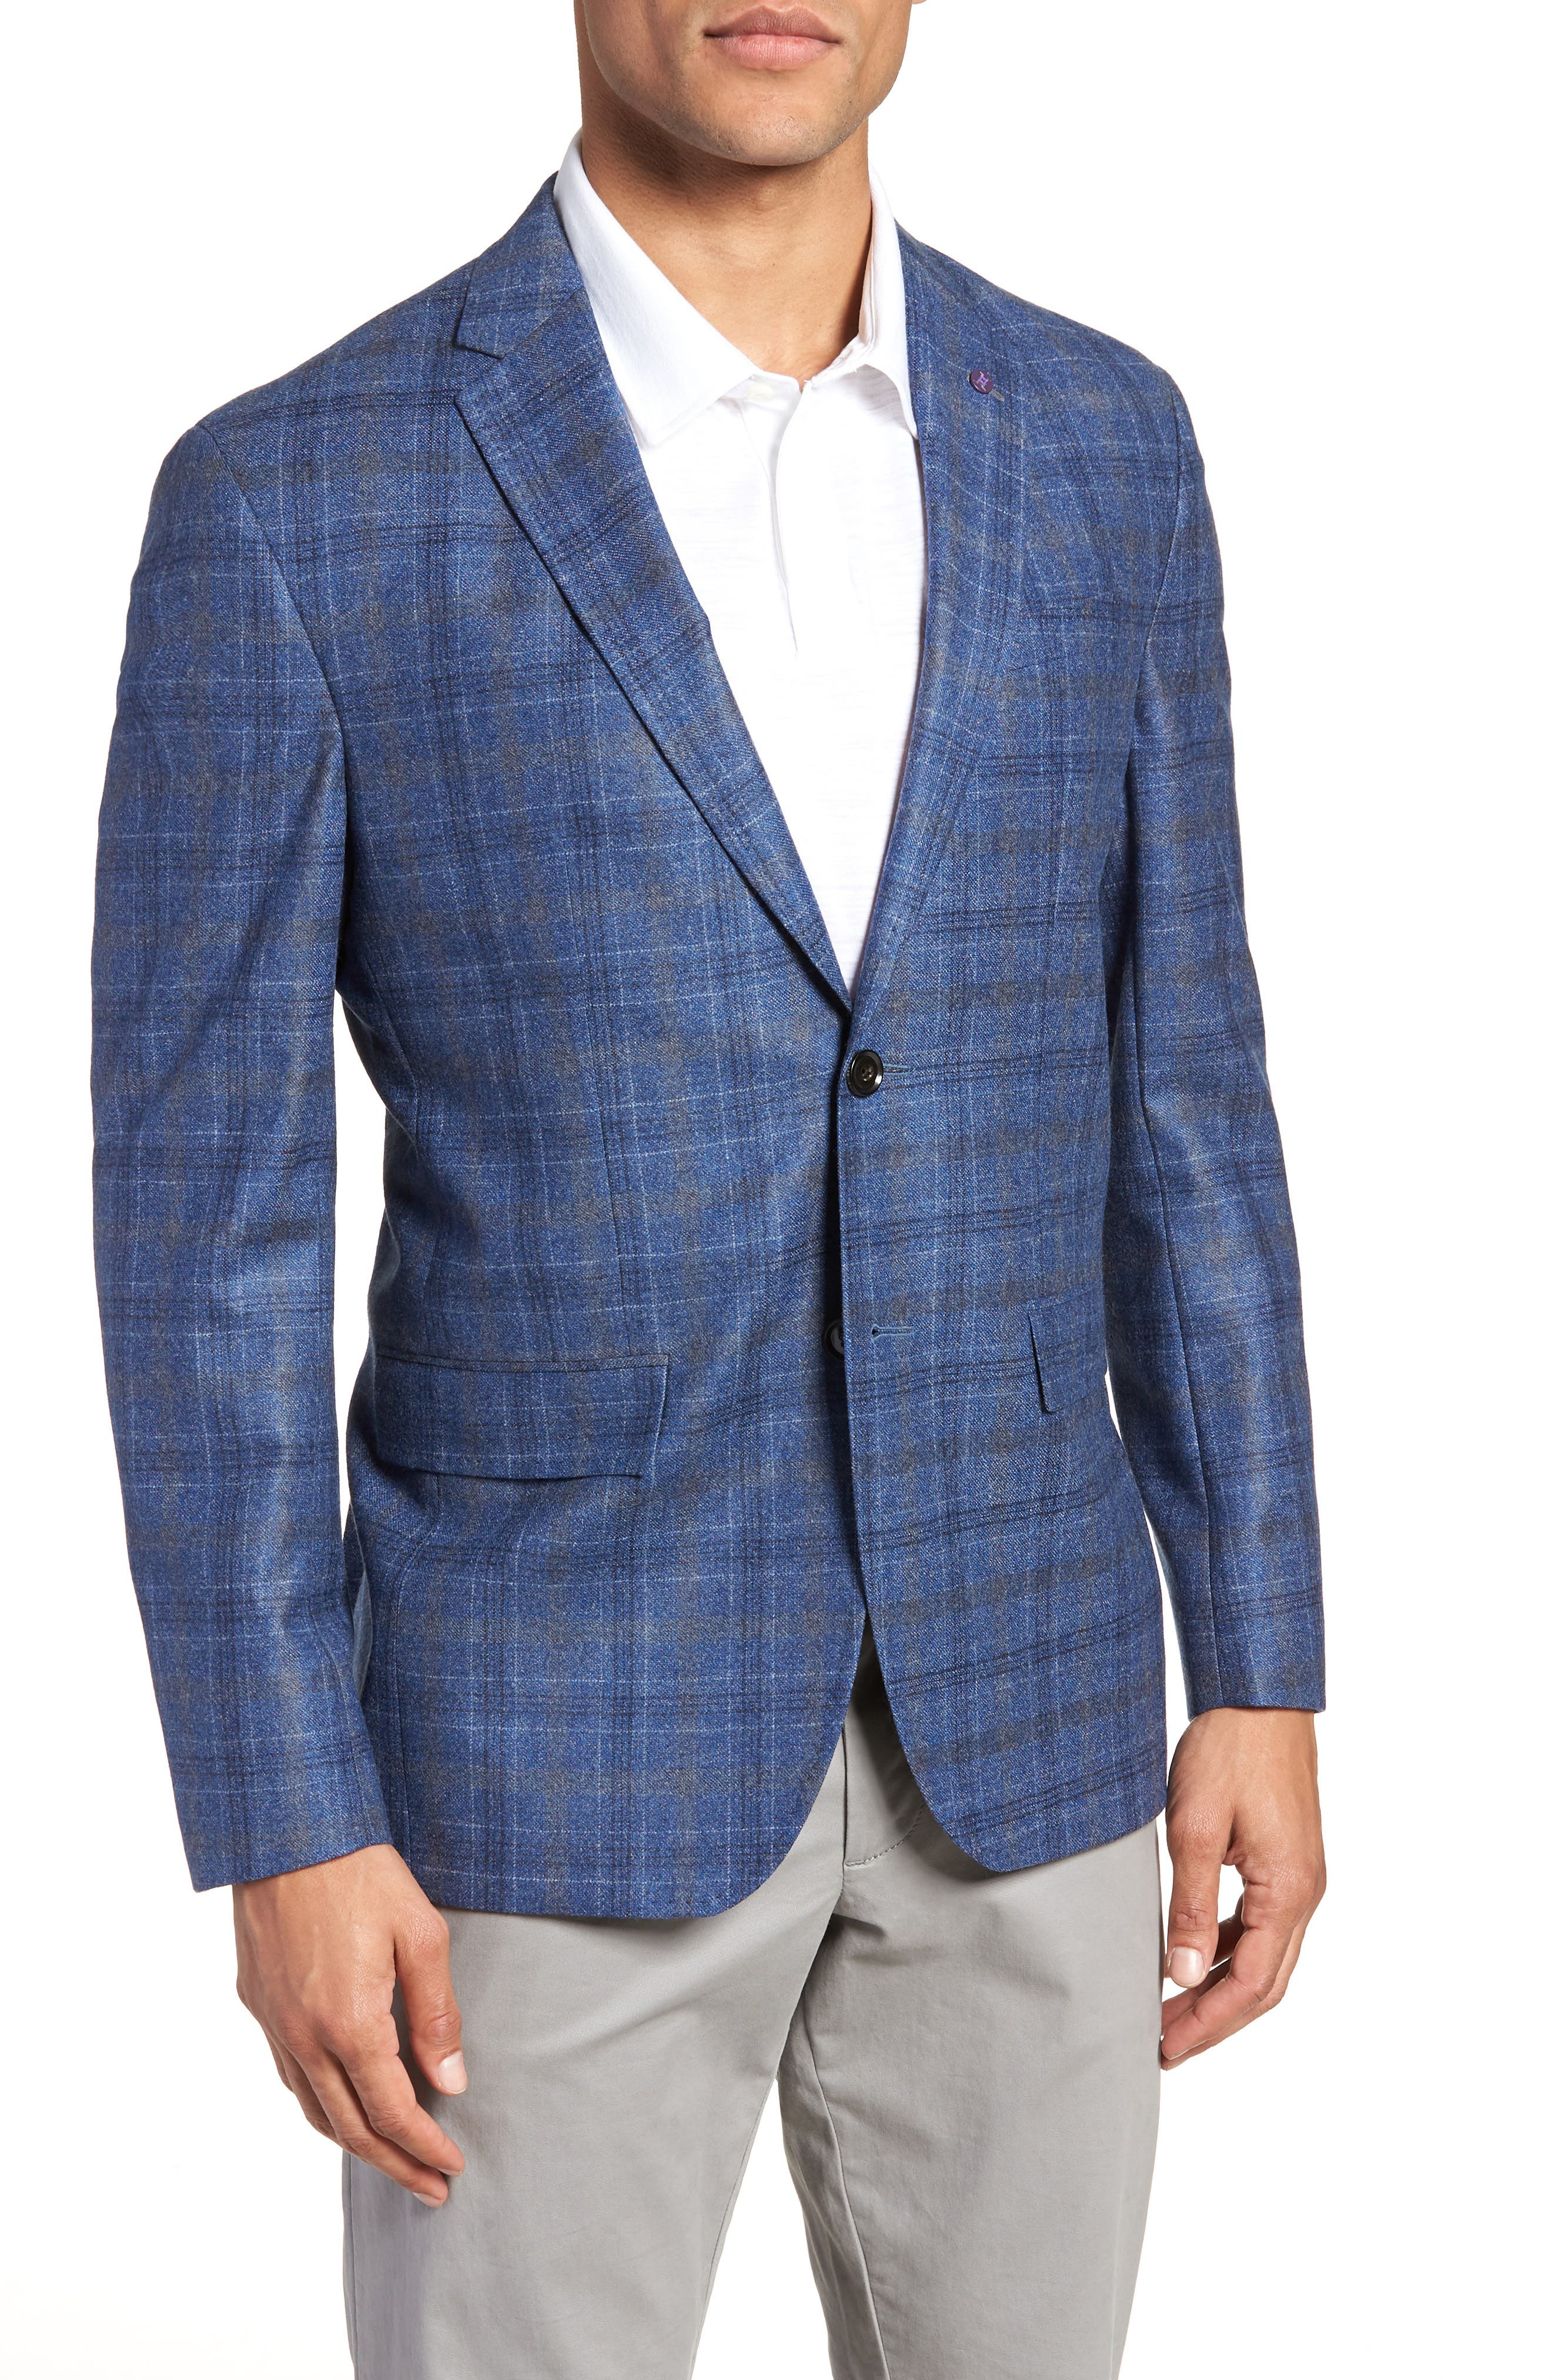 Konan Trim Fit Plaid Wool Sport Coat,                             Main thumbnail 1, color,                             BLUE